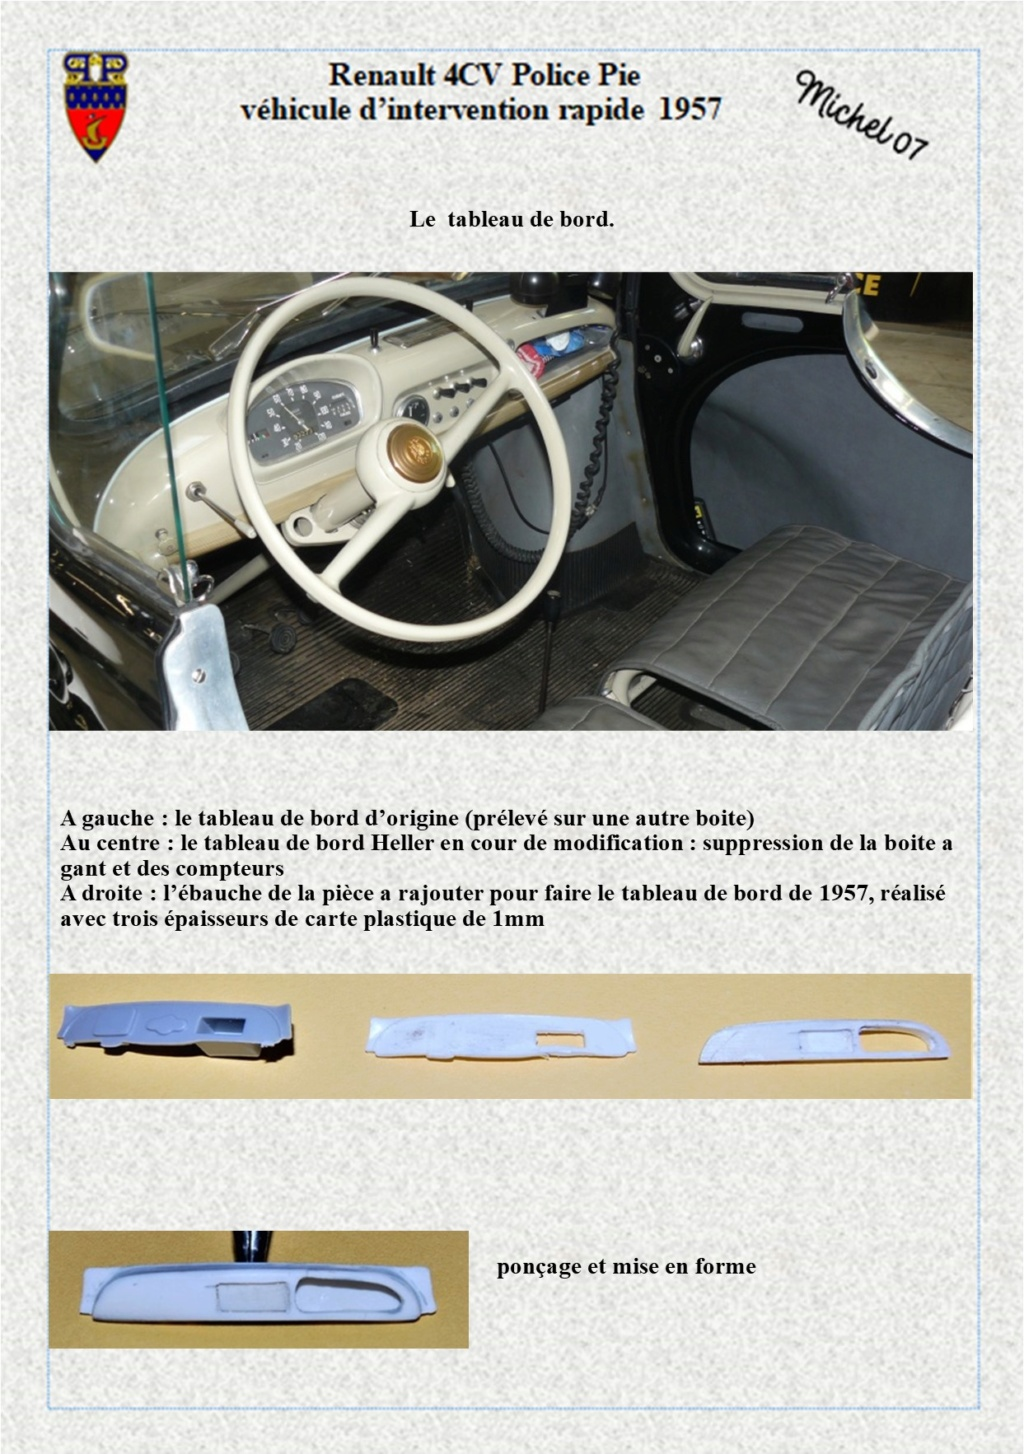 renault 4 cv pie 1957 Heller 1/24 (Terminé) Image219